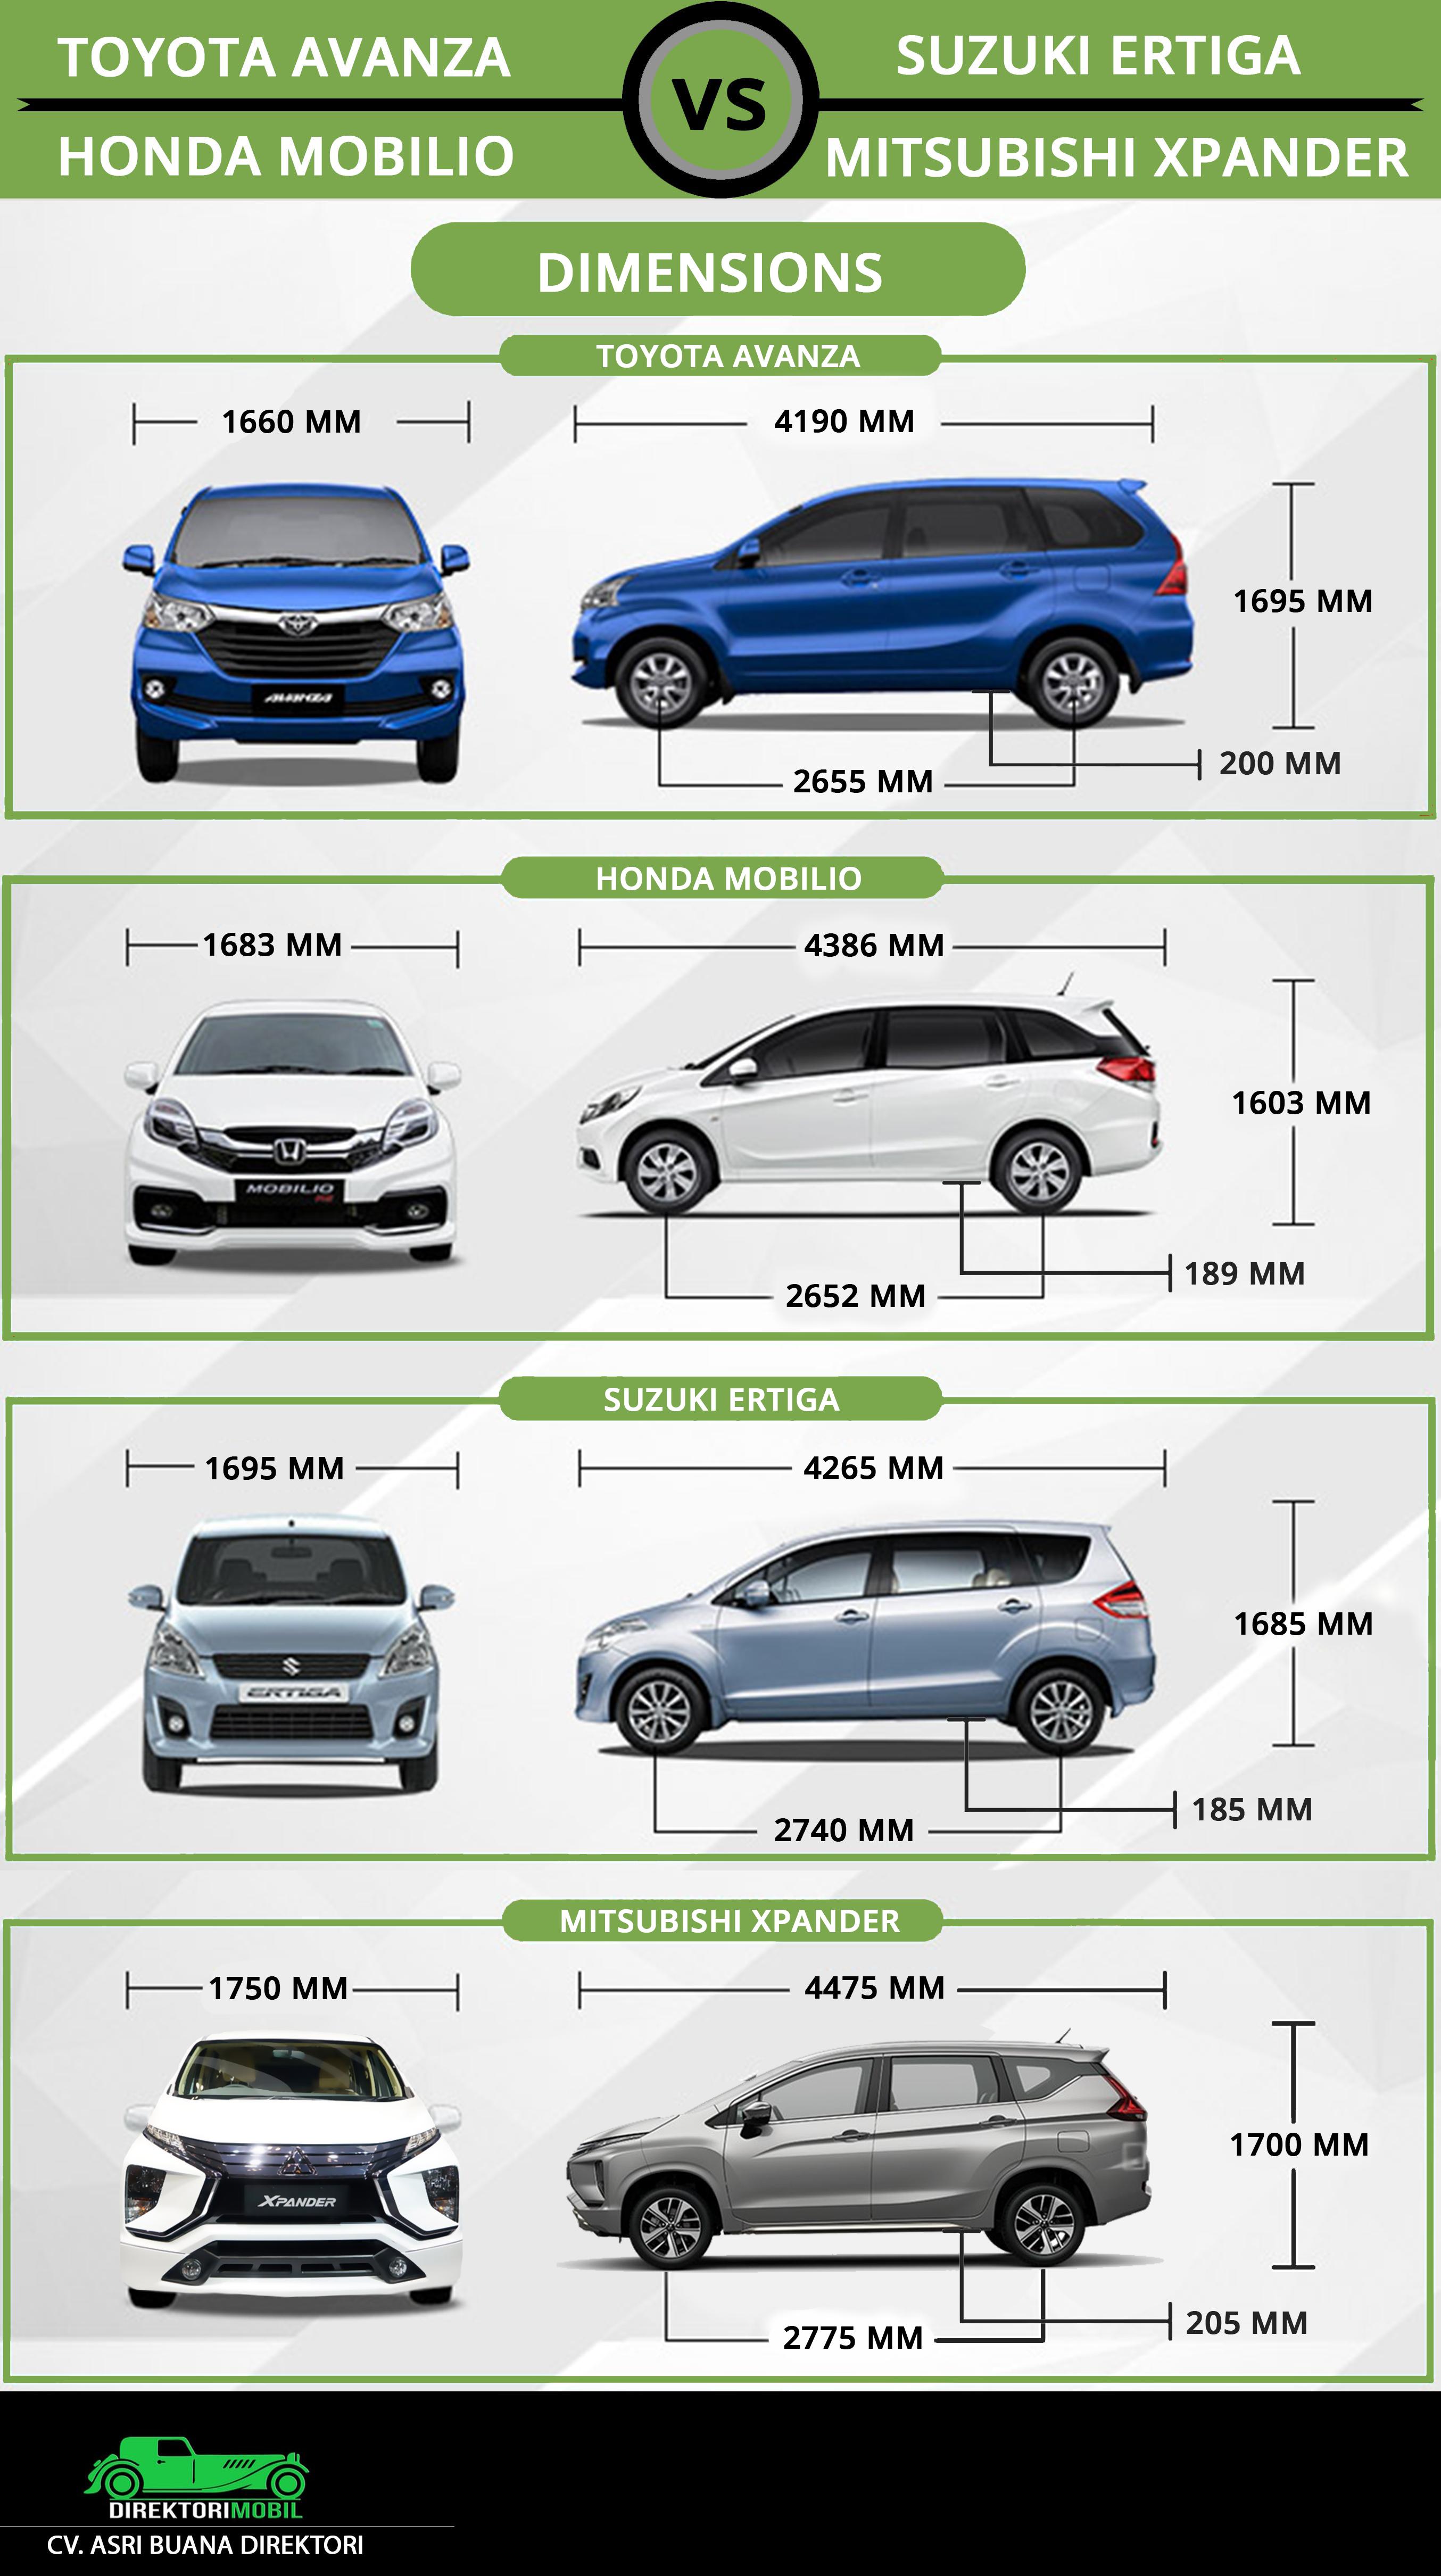 Dimensi Grand New Avanza Toyota Yaris Trd 2014 Harga Komparasi Suzuki Ertigas Honda Mobilio Dan Mitsubishi Xpander Dari Segi